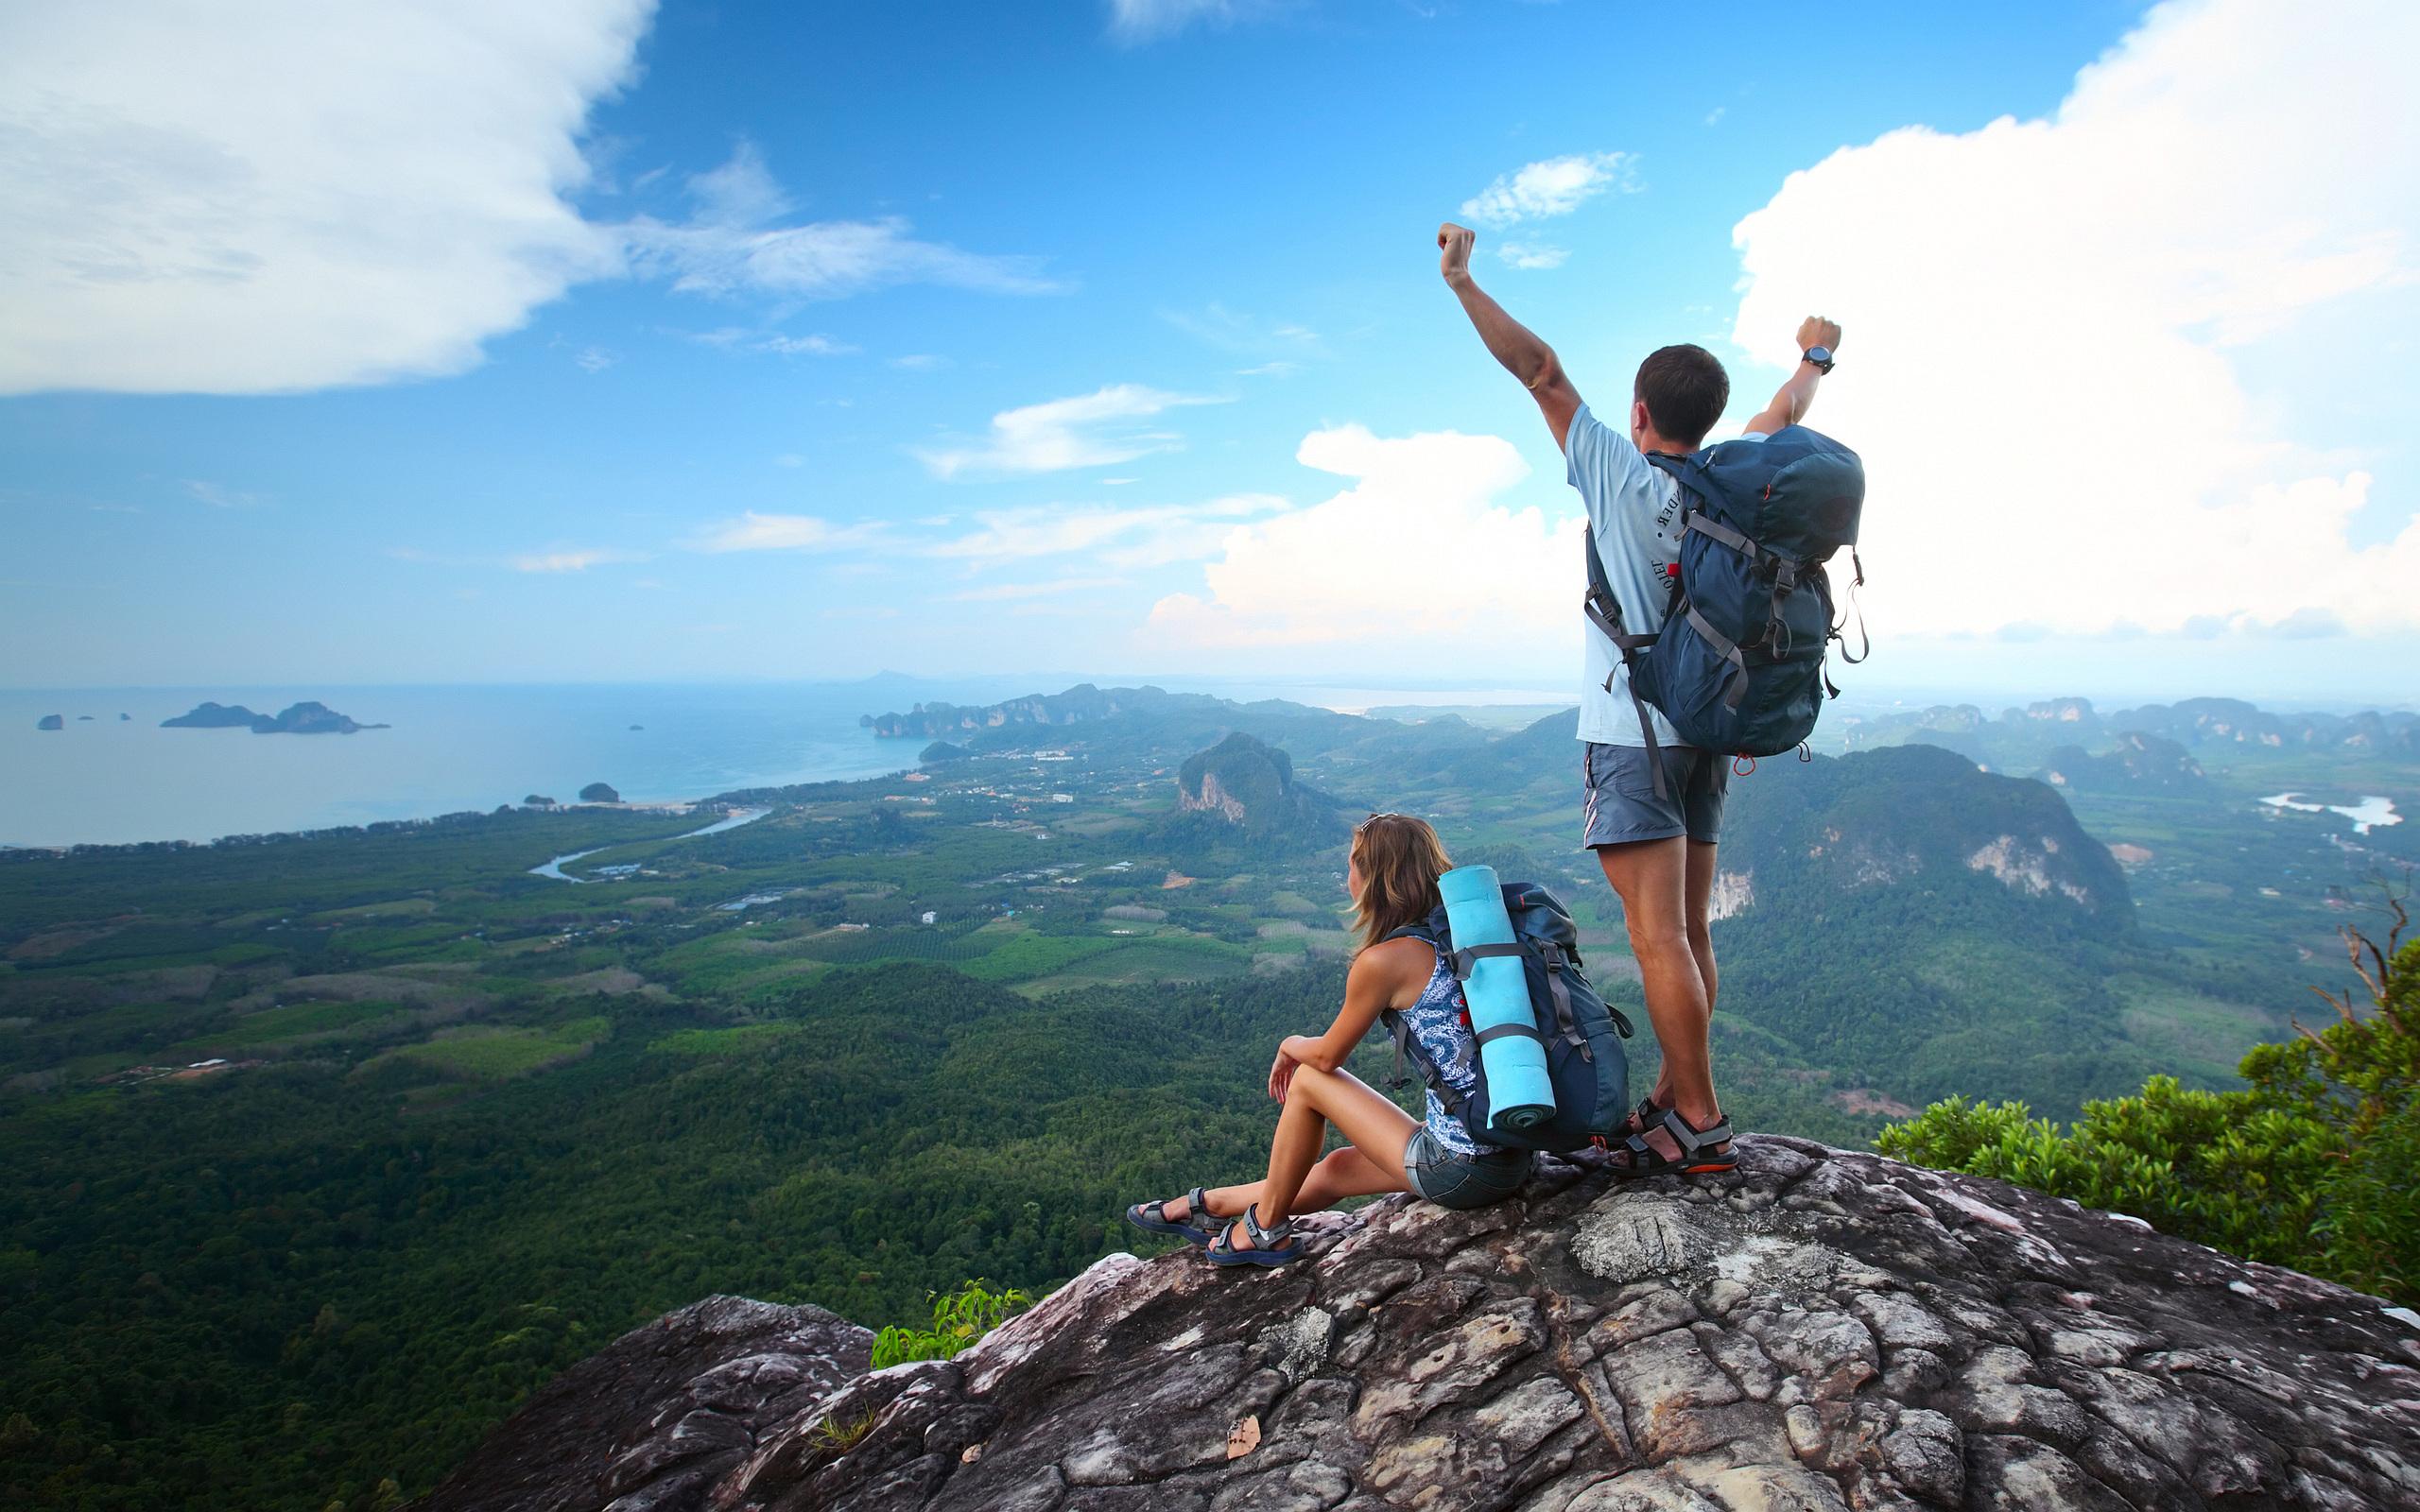 635693880042525992-518822648_couple-hiking-valley.jpg